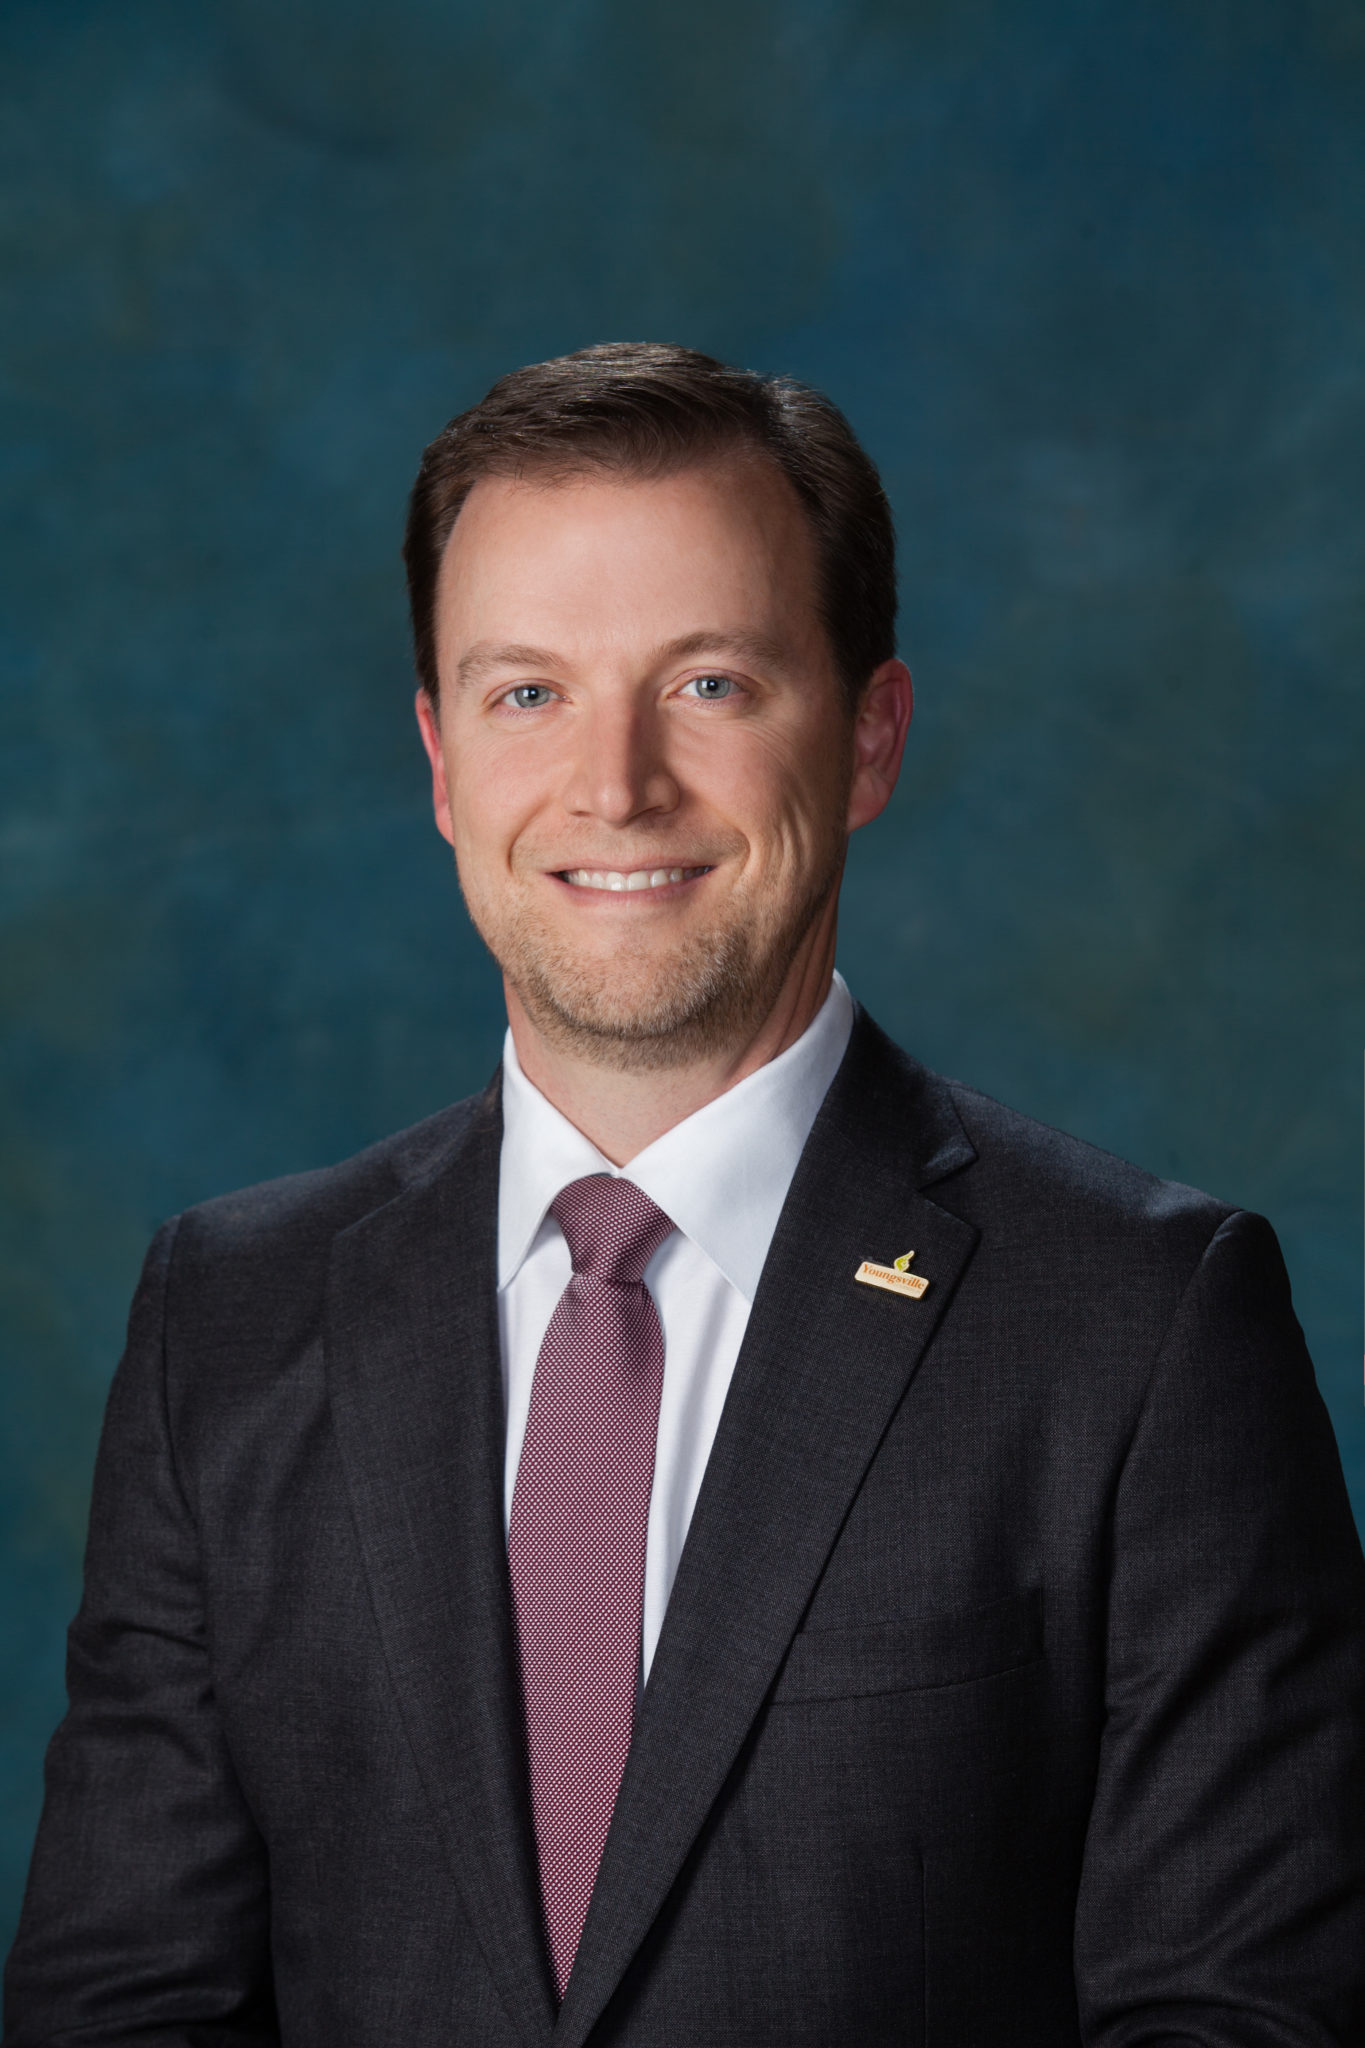 Ken Ritter - Mayor